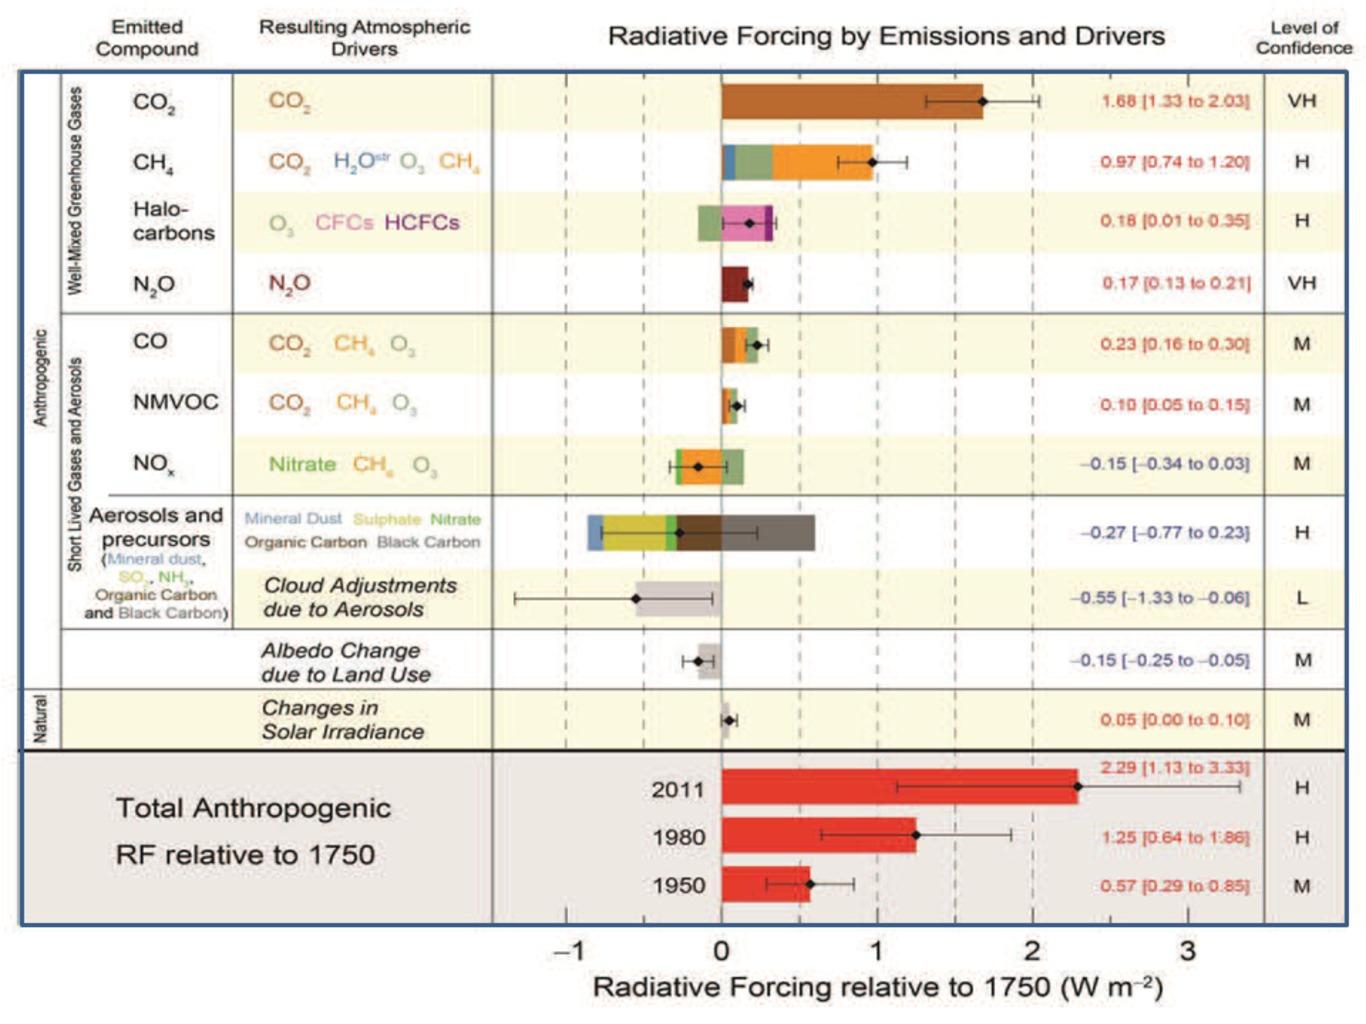 Proiezione Climatica for Europe , Trend 2030/2060.-6rqm2y5q-1380278533.jpg